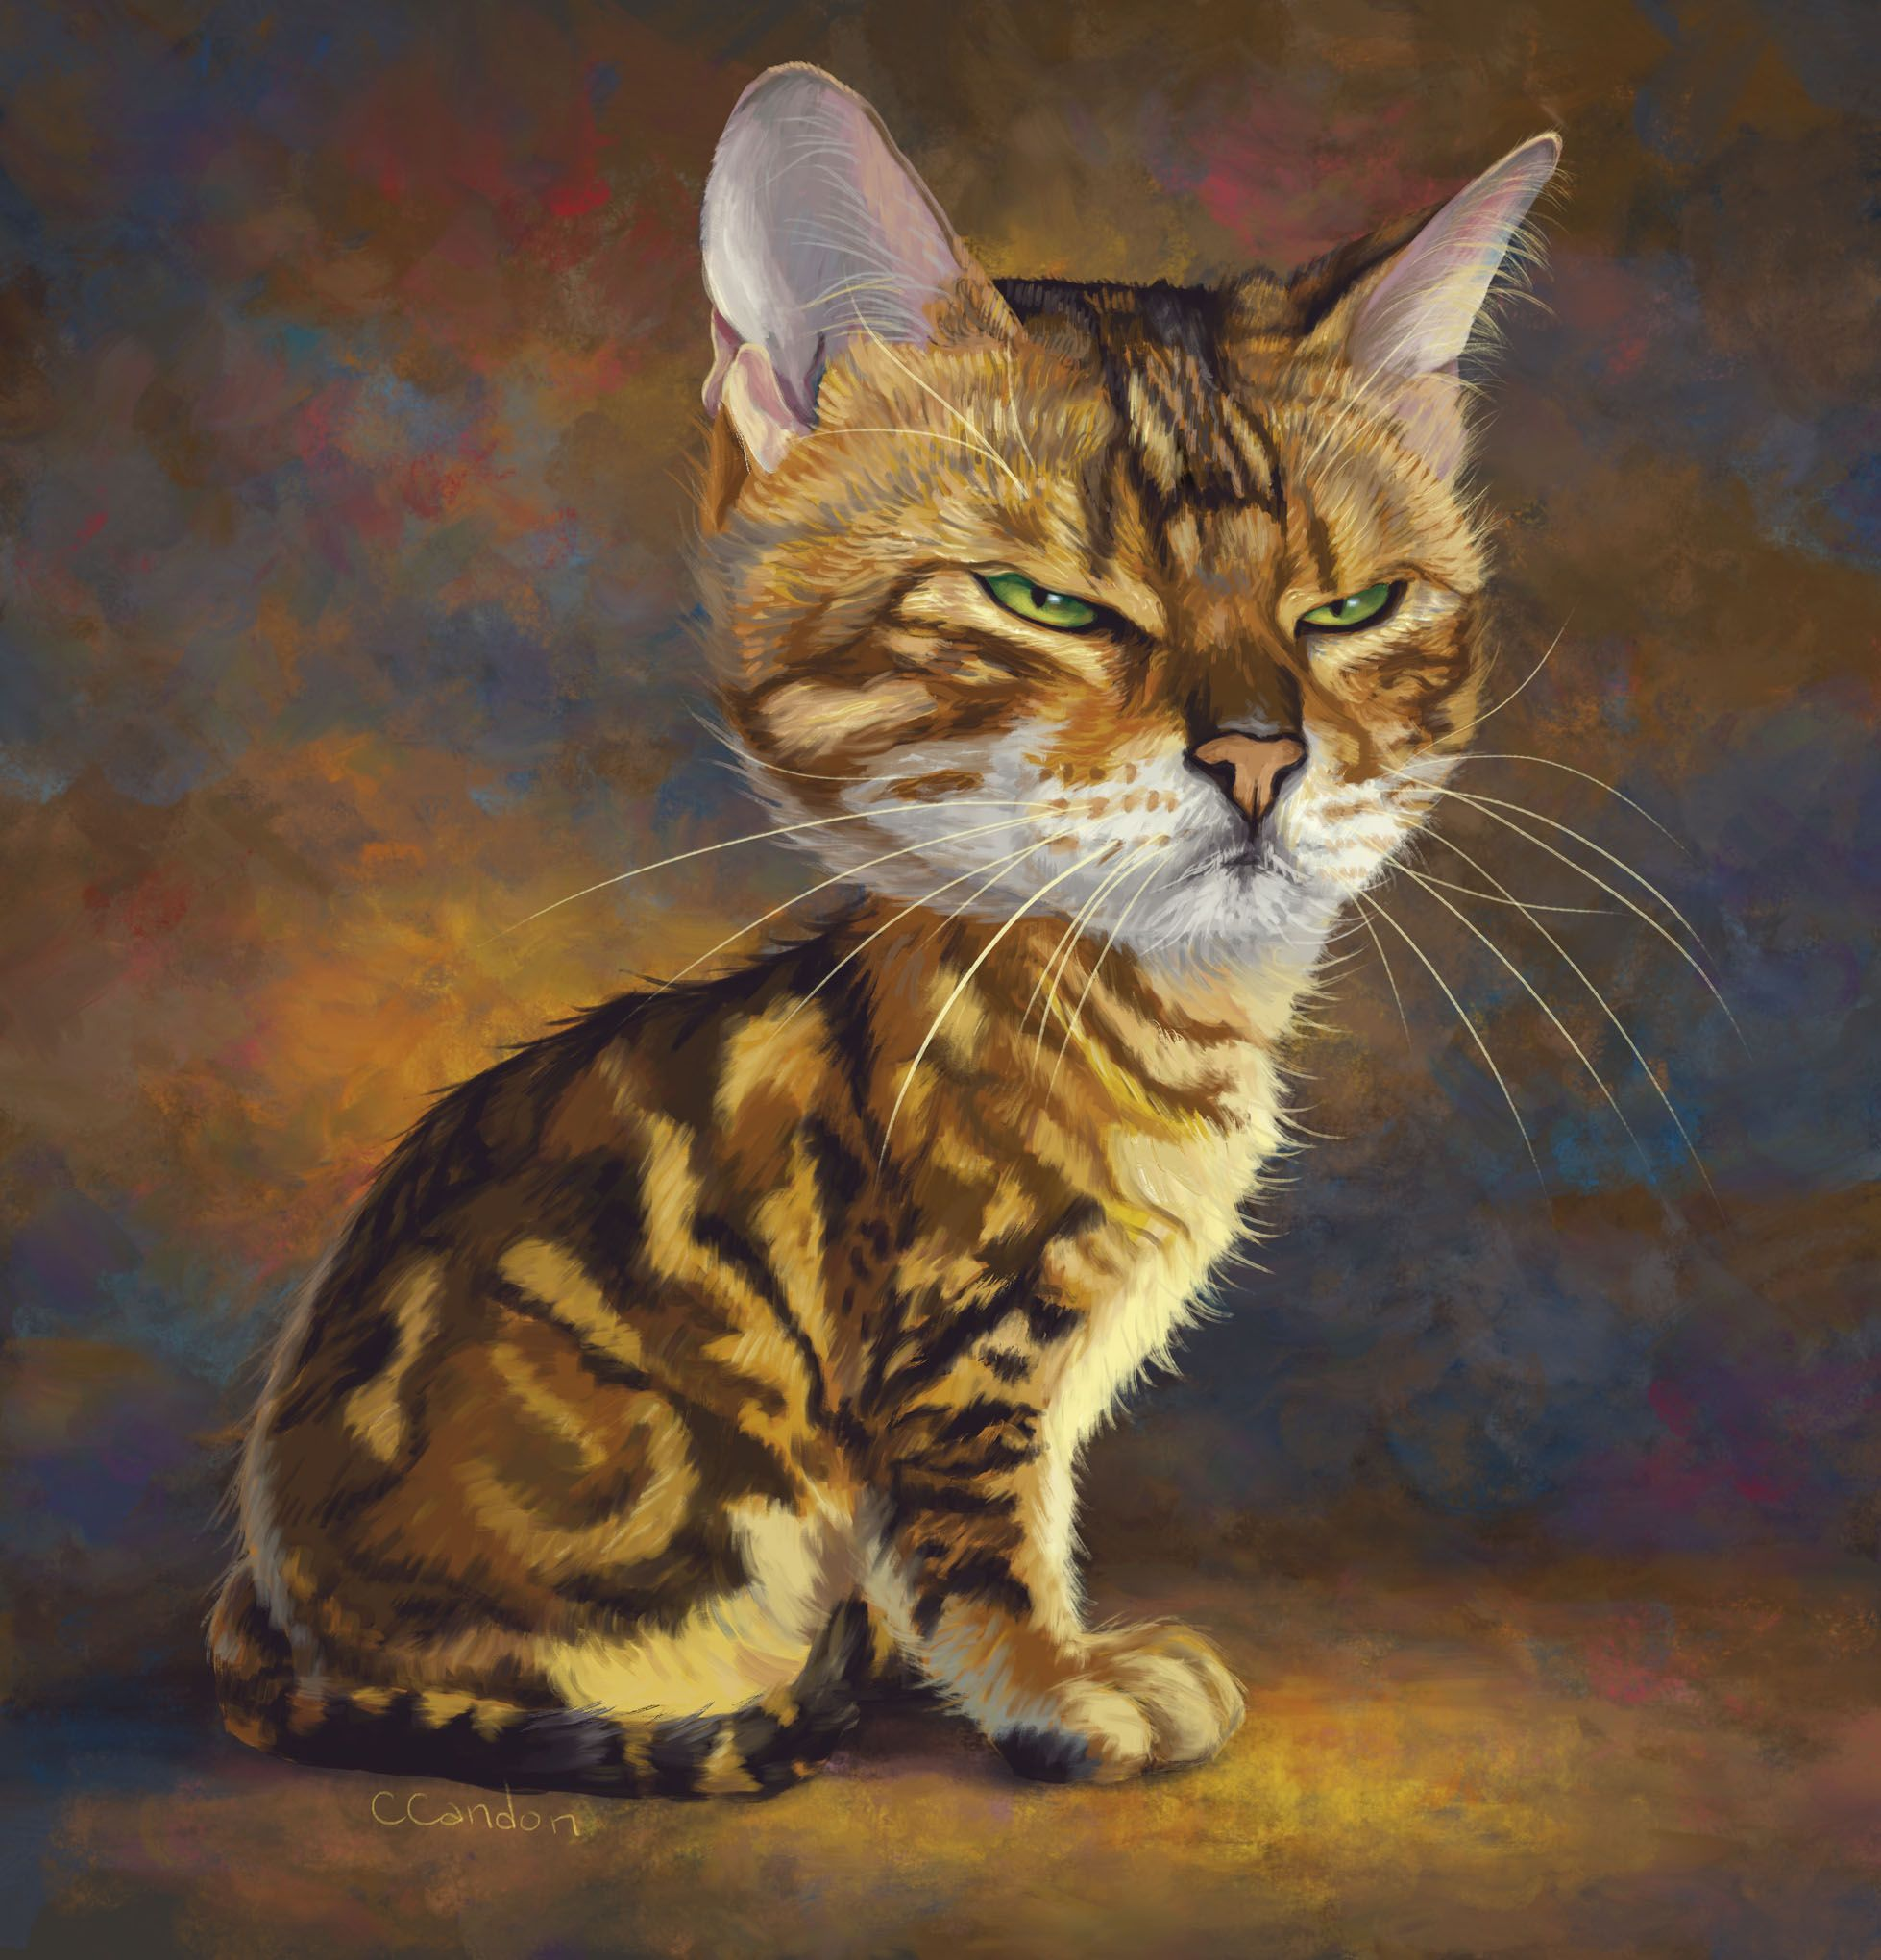 Cat With Attitude Animal Caricature Bengal Cat Cats